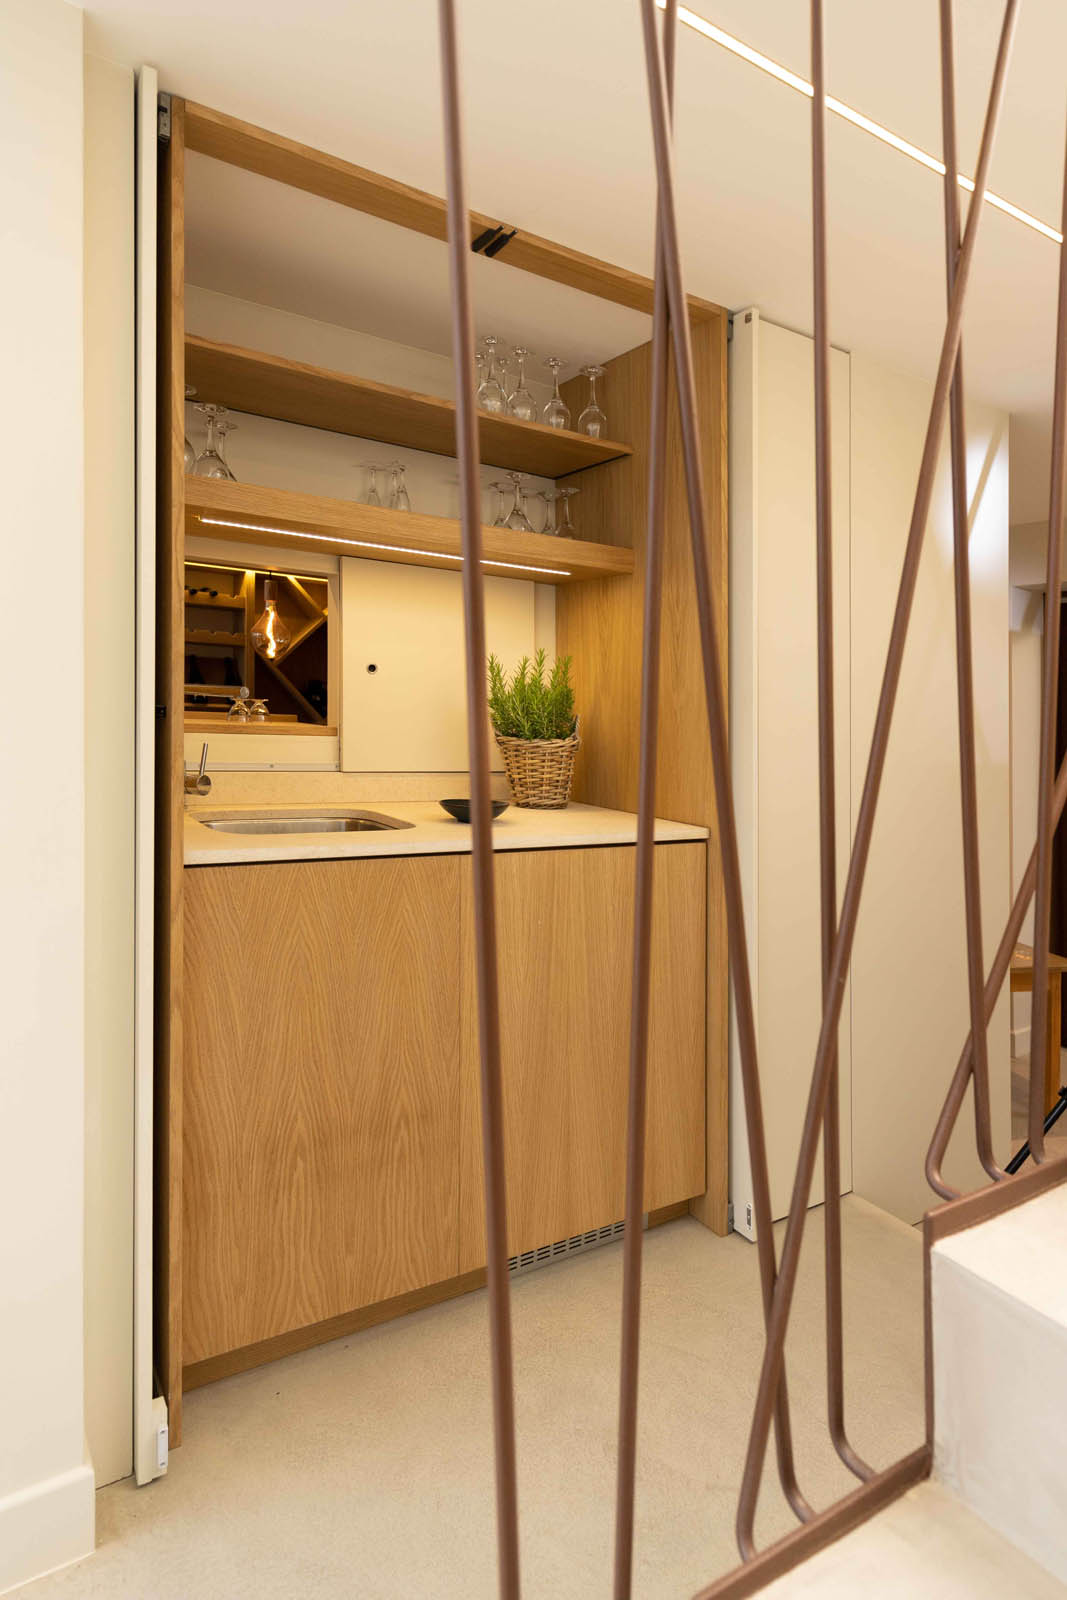 03_renovation-interieur_Invivhome-Idésia ©StudioRobinIssartel